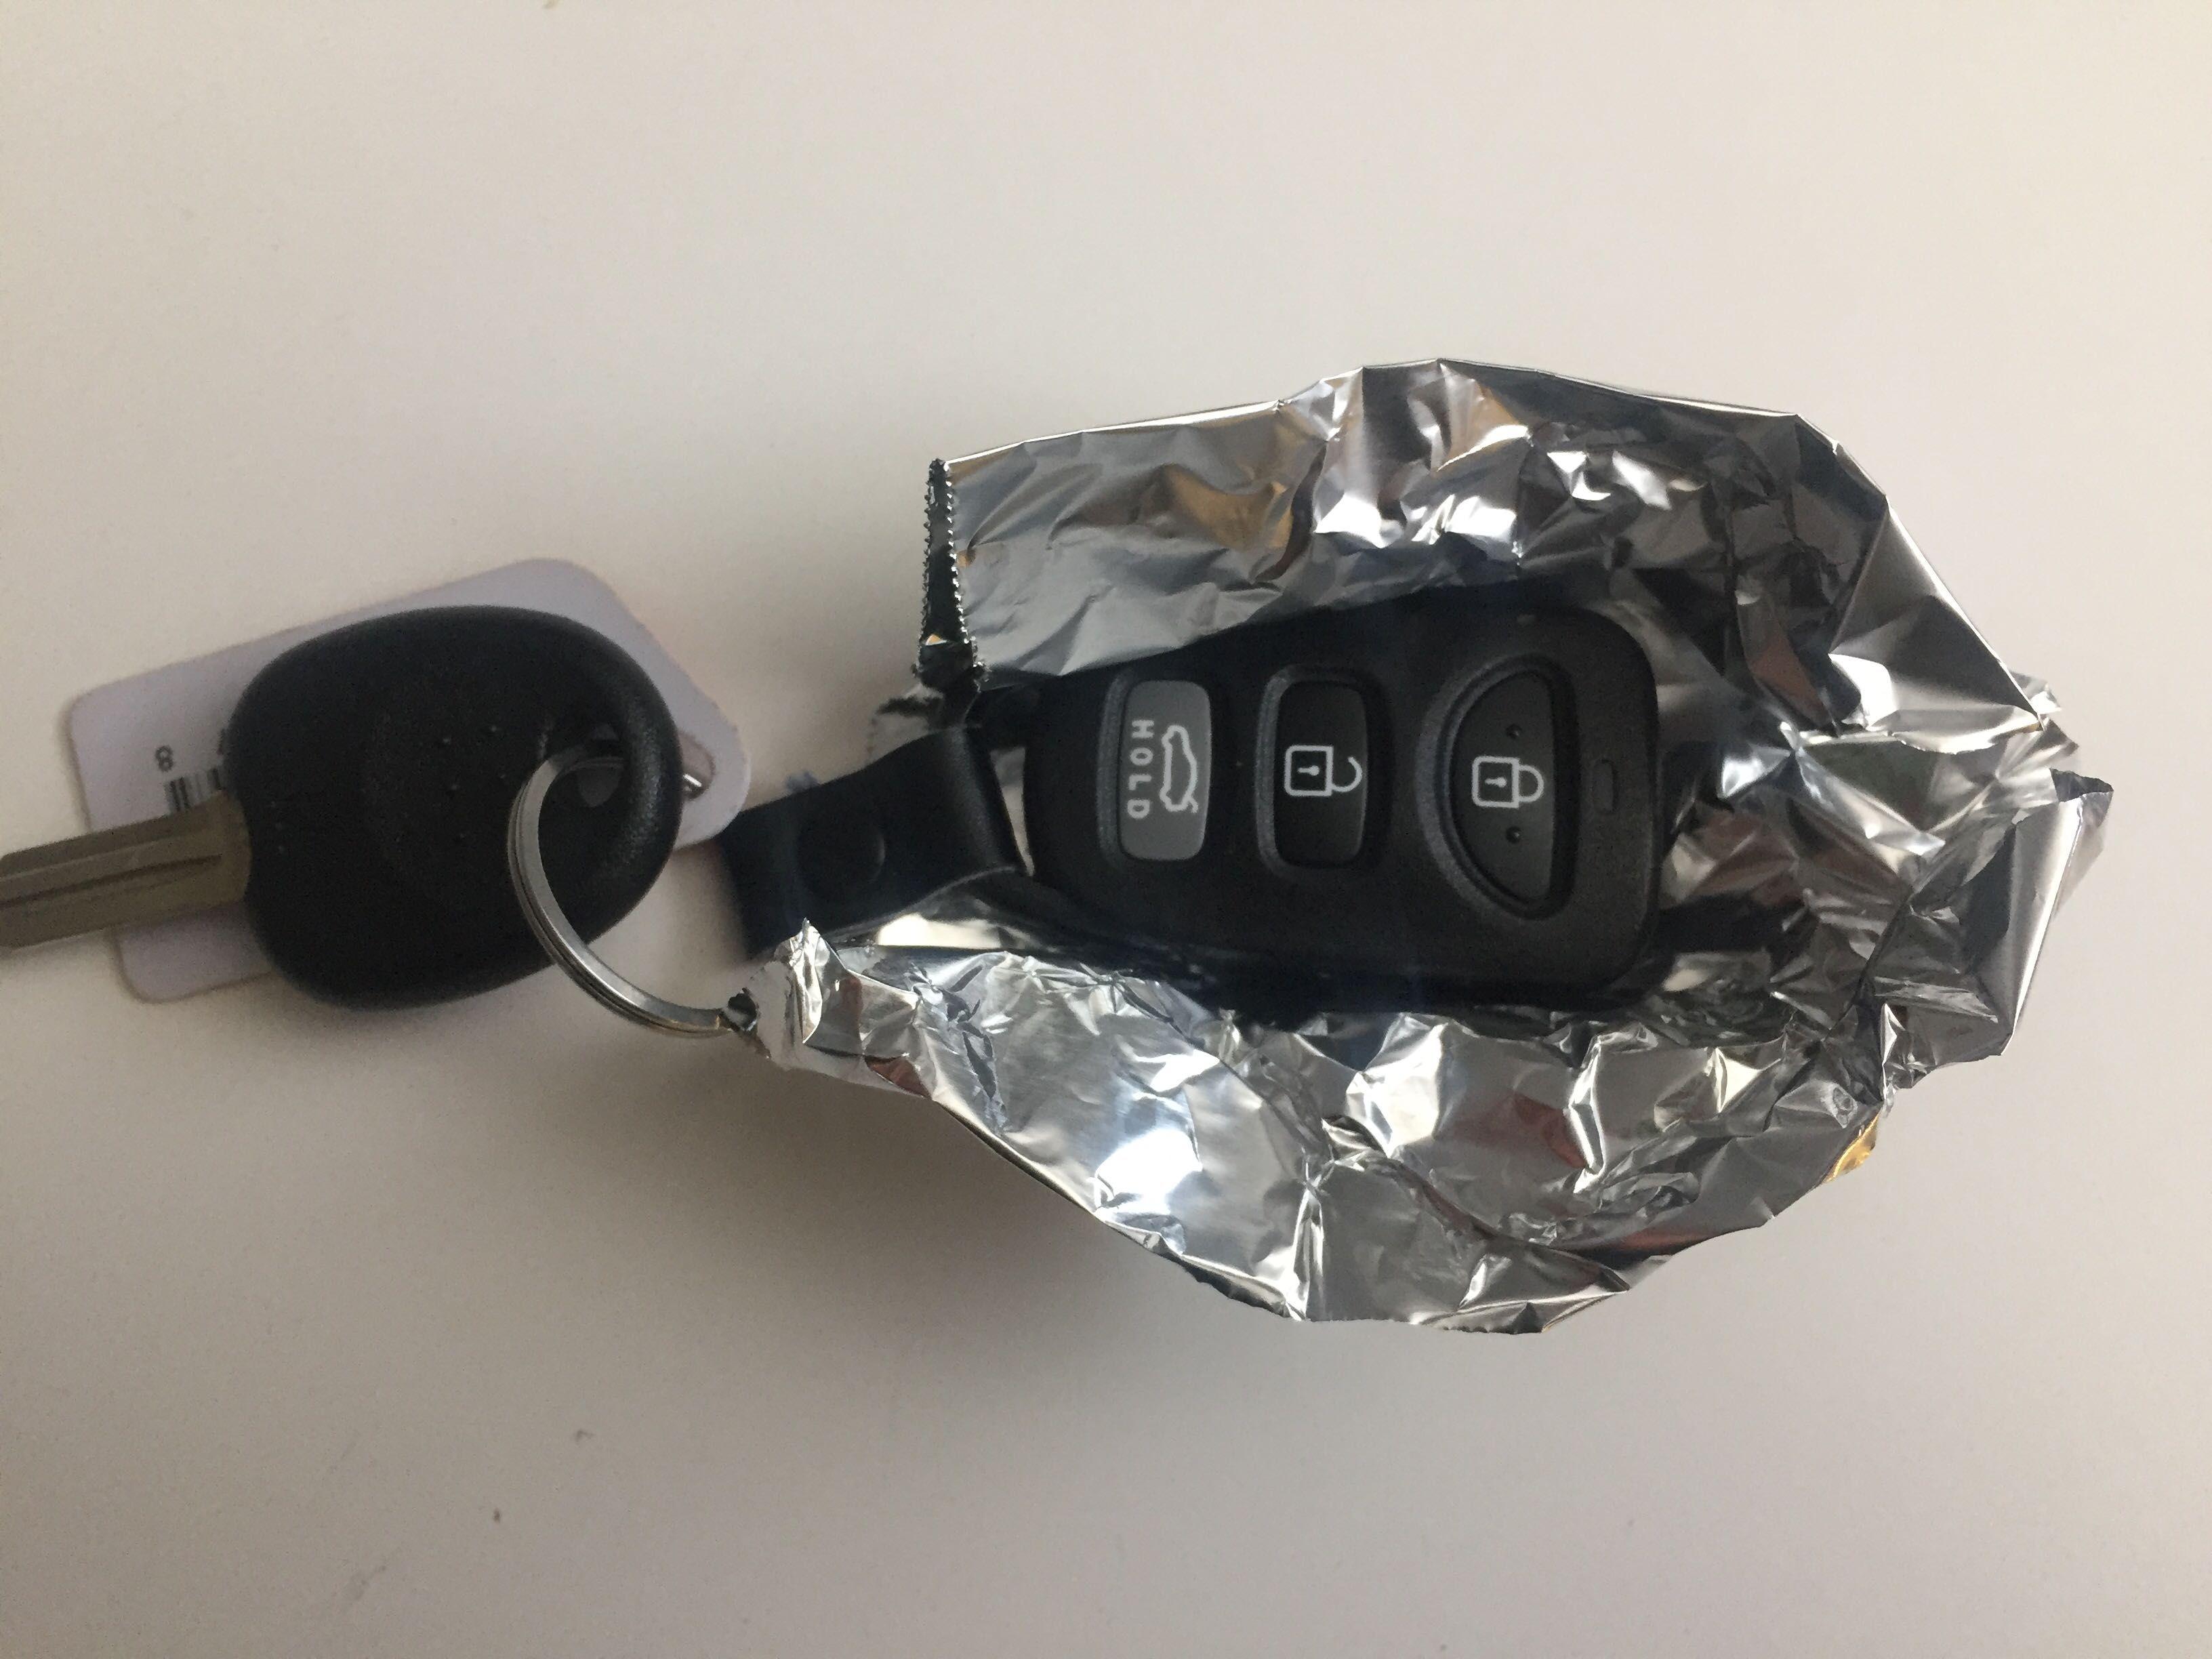 Key fob in aluminum foil